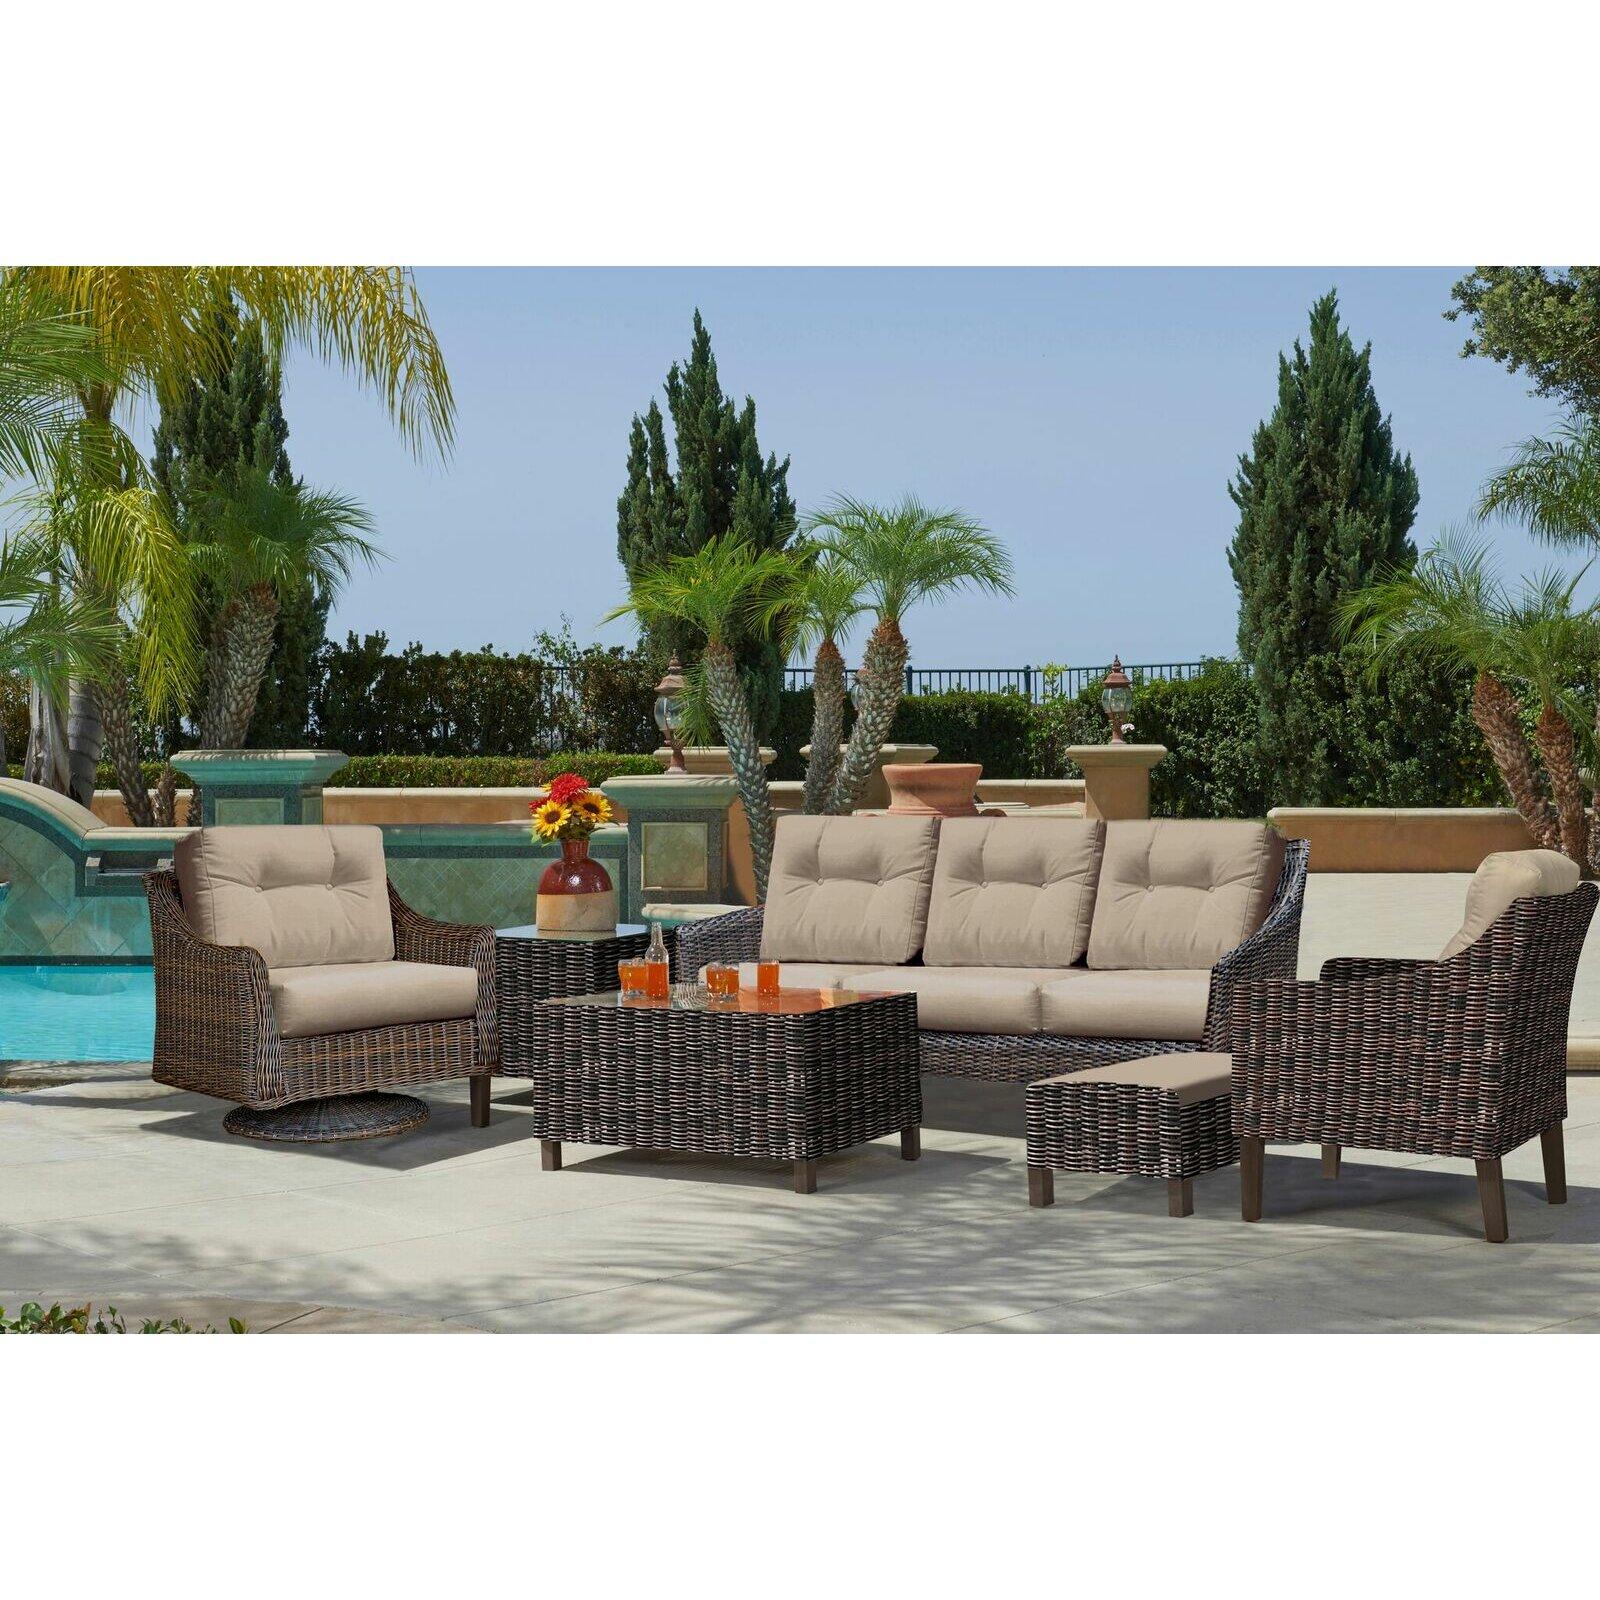 North Cape International Trenton  Piece Sofa Set  Reviews Wayfair - North cape outdoor furniture